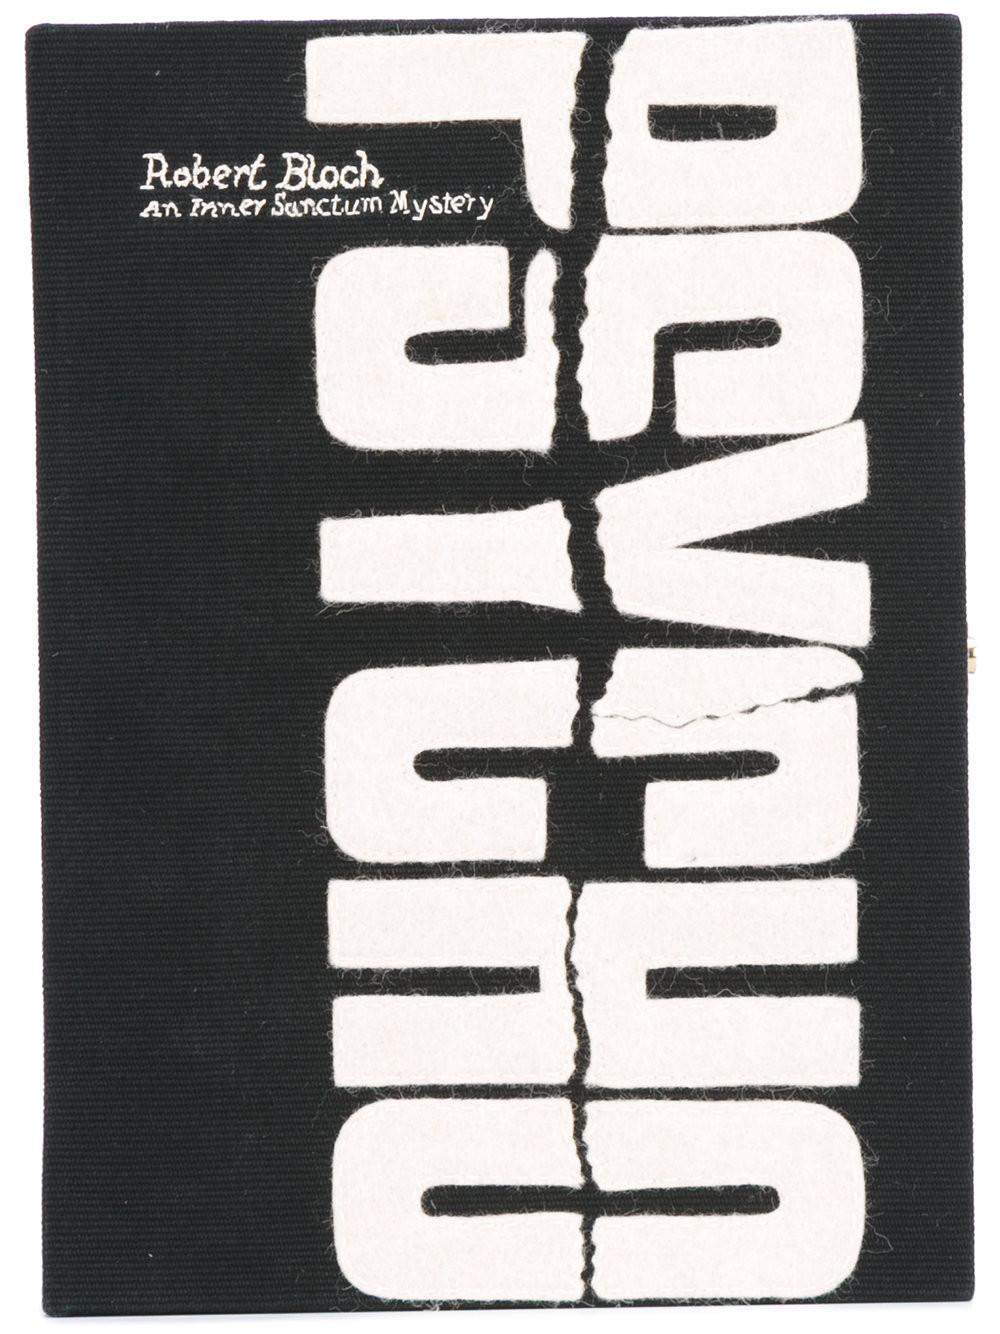 OLYMPIA LE-TAN Psycho Appliquéd Cotton-Faille Clutch in Black